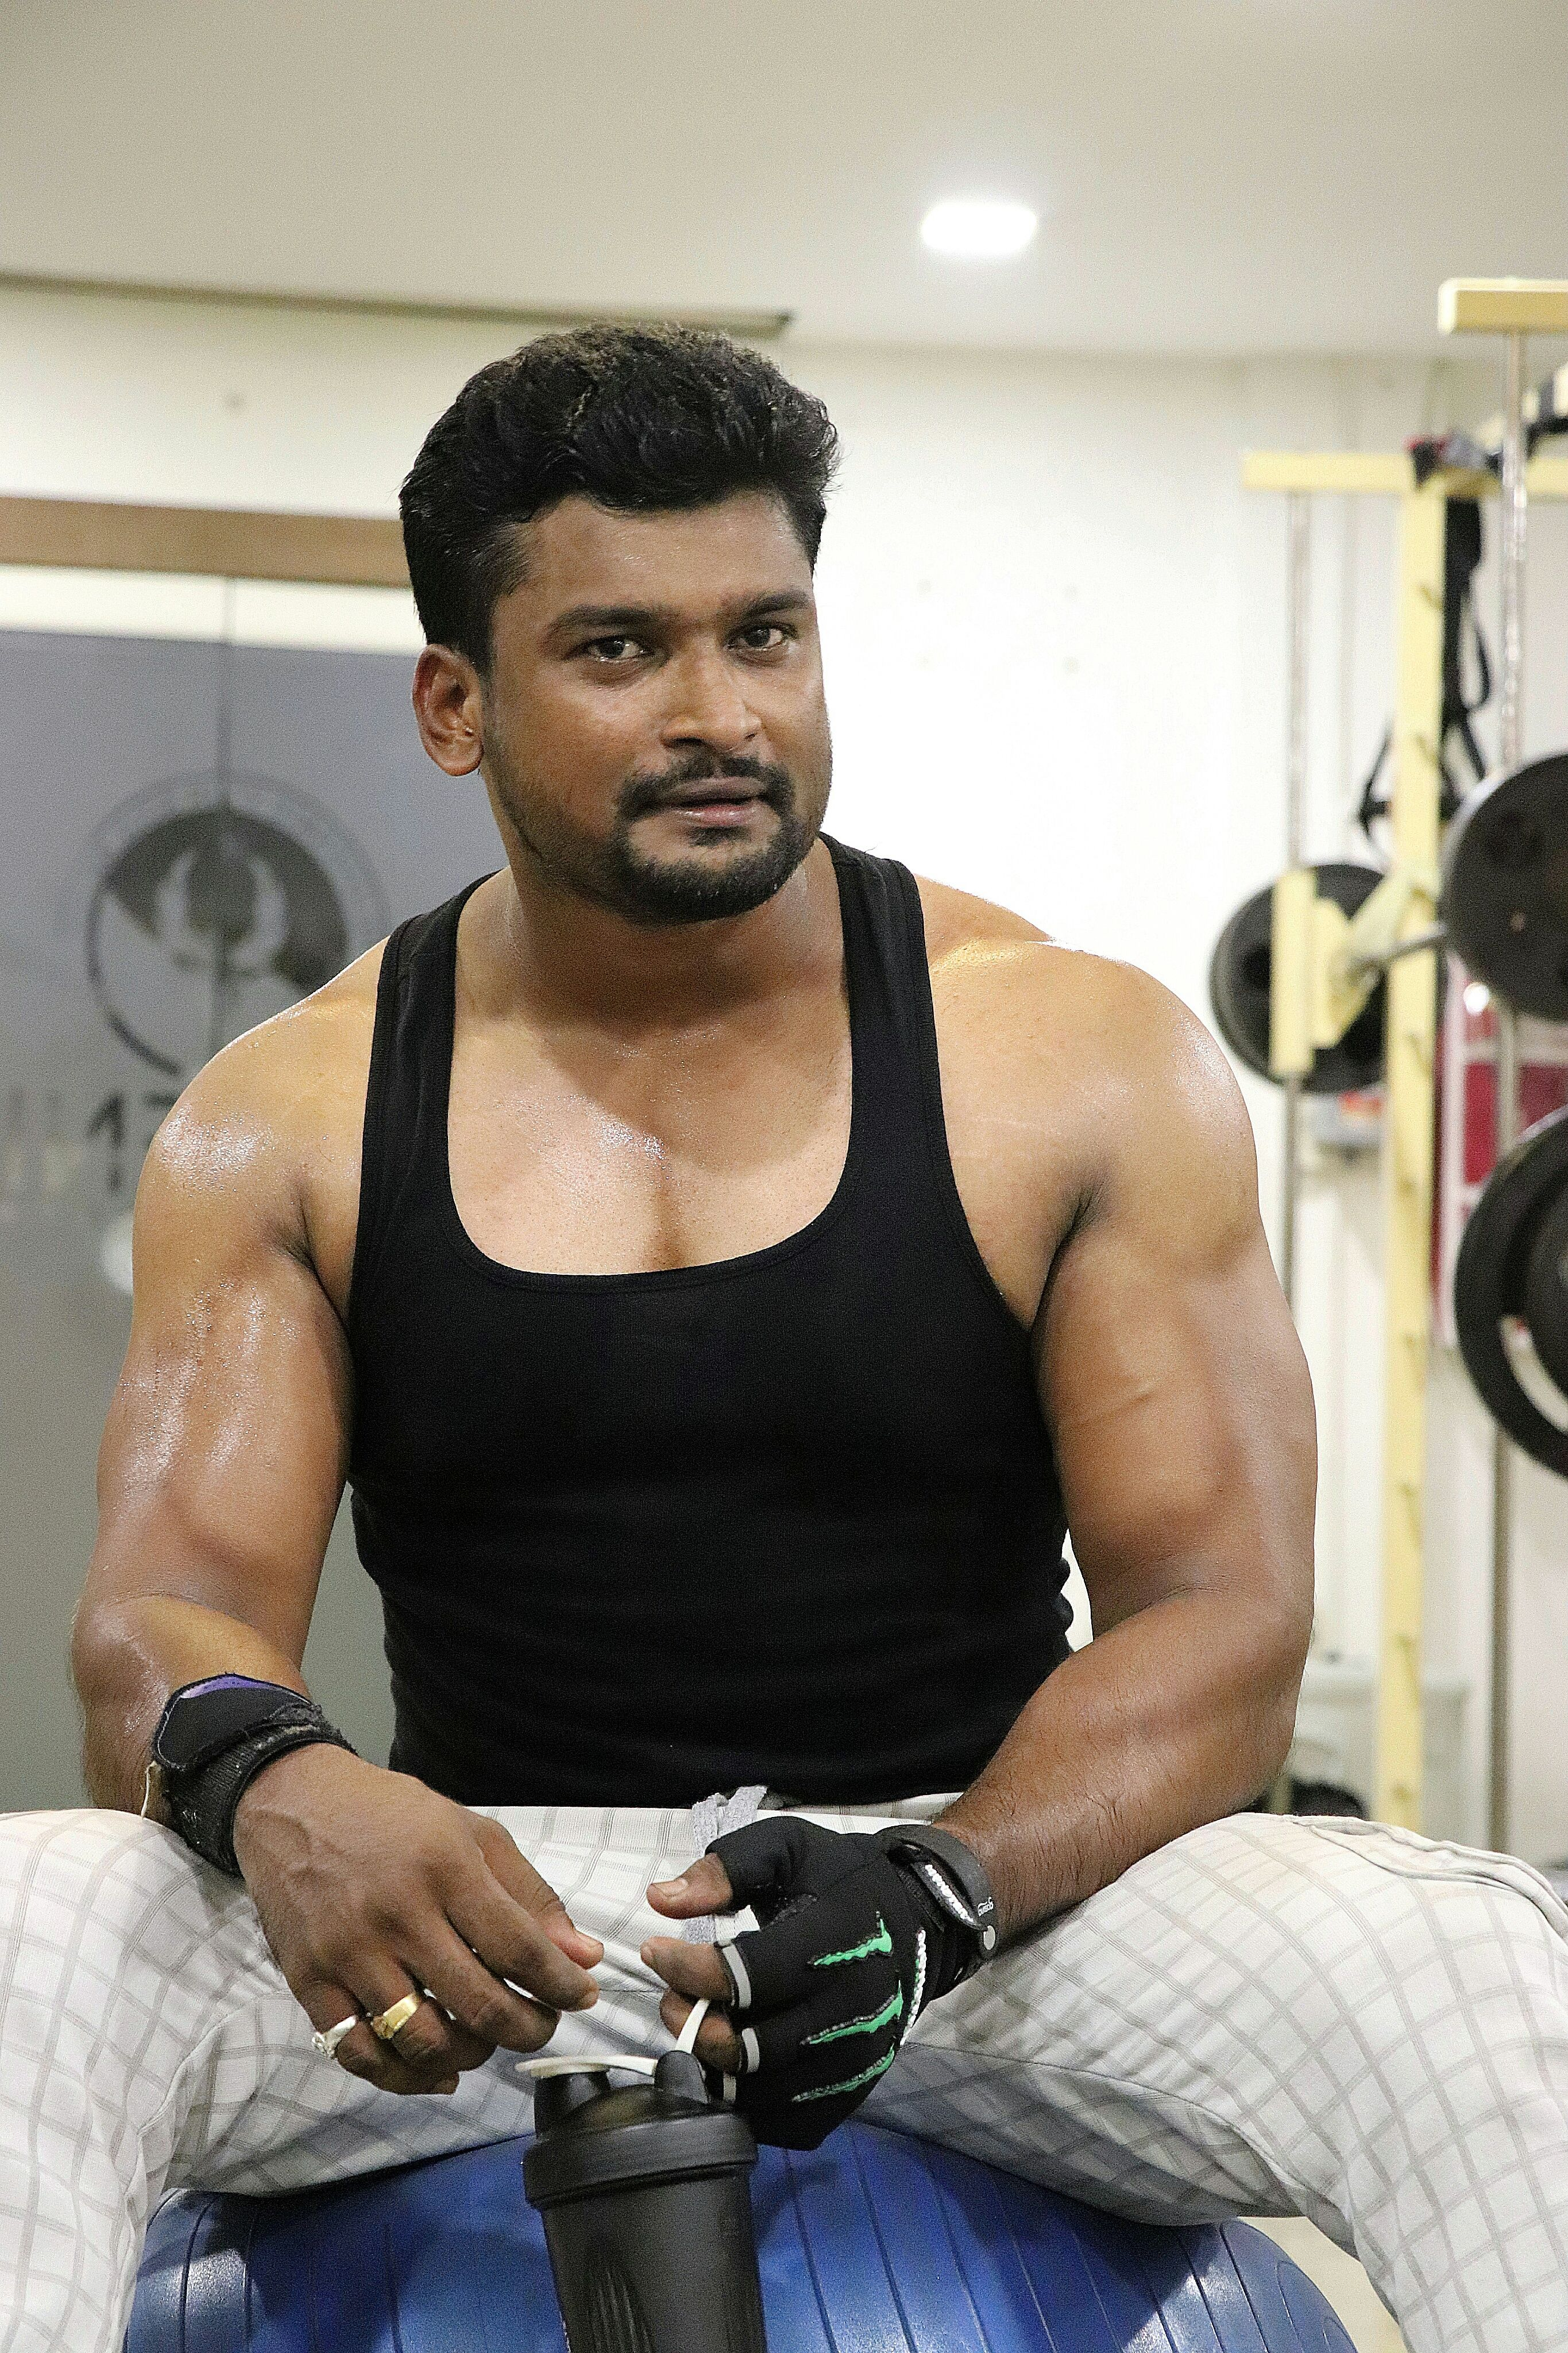 Fitness Trainer Sujith Kumar S Phoenix Fitness Centre In Haripad Kerala Phoenix Fitness Fitnesscentre Gym Workou Family Fitness Fitness Fitness Trainer